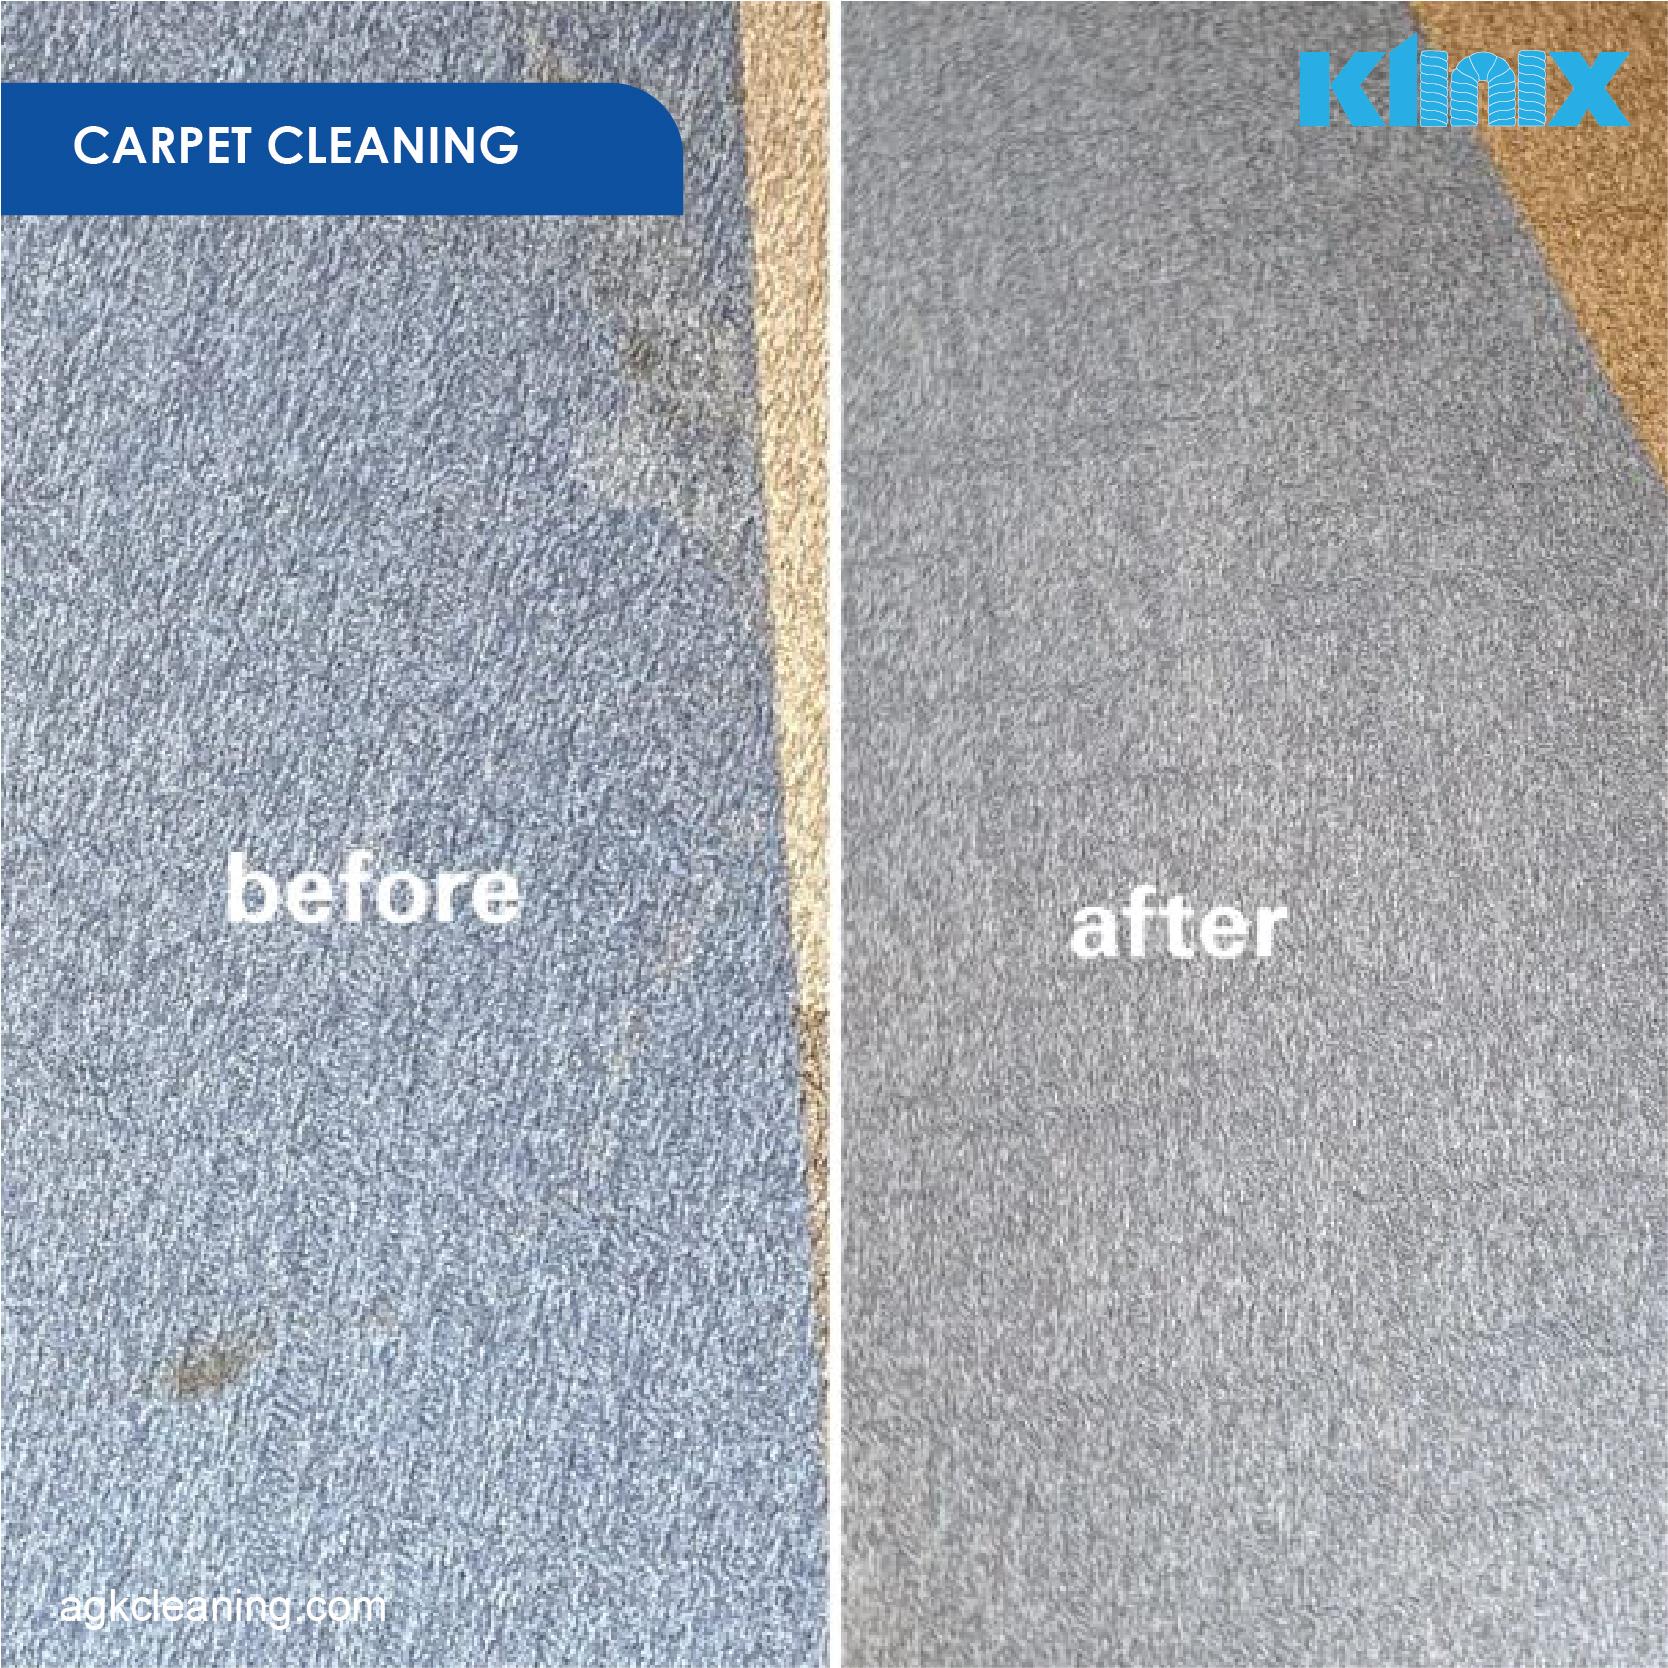 Jasa Cuci Karpet Carpet Cleaning Services